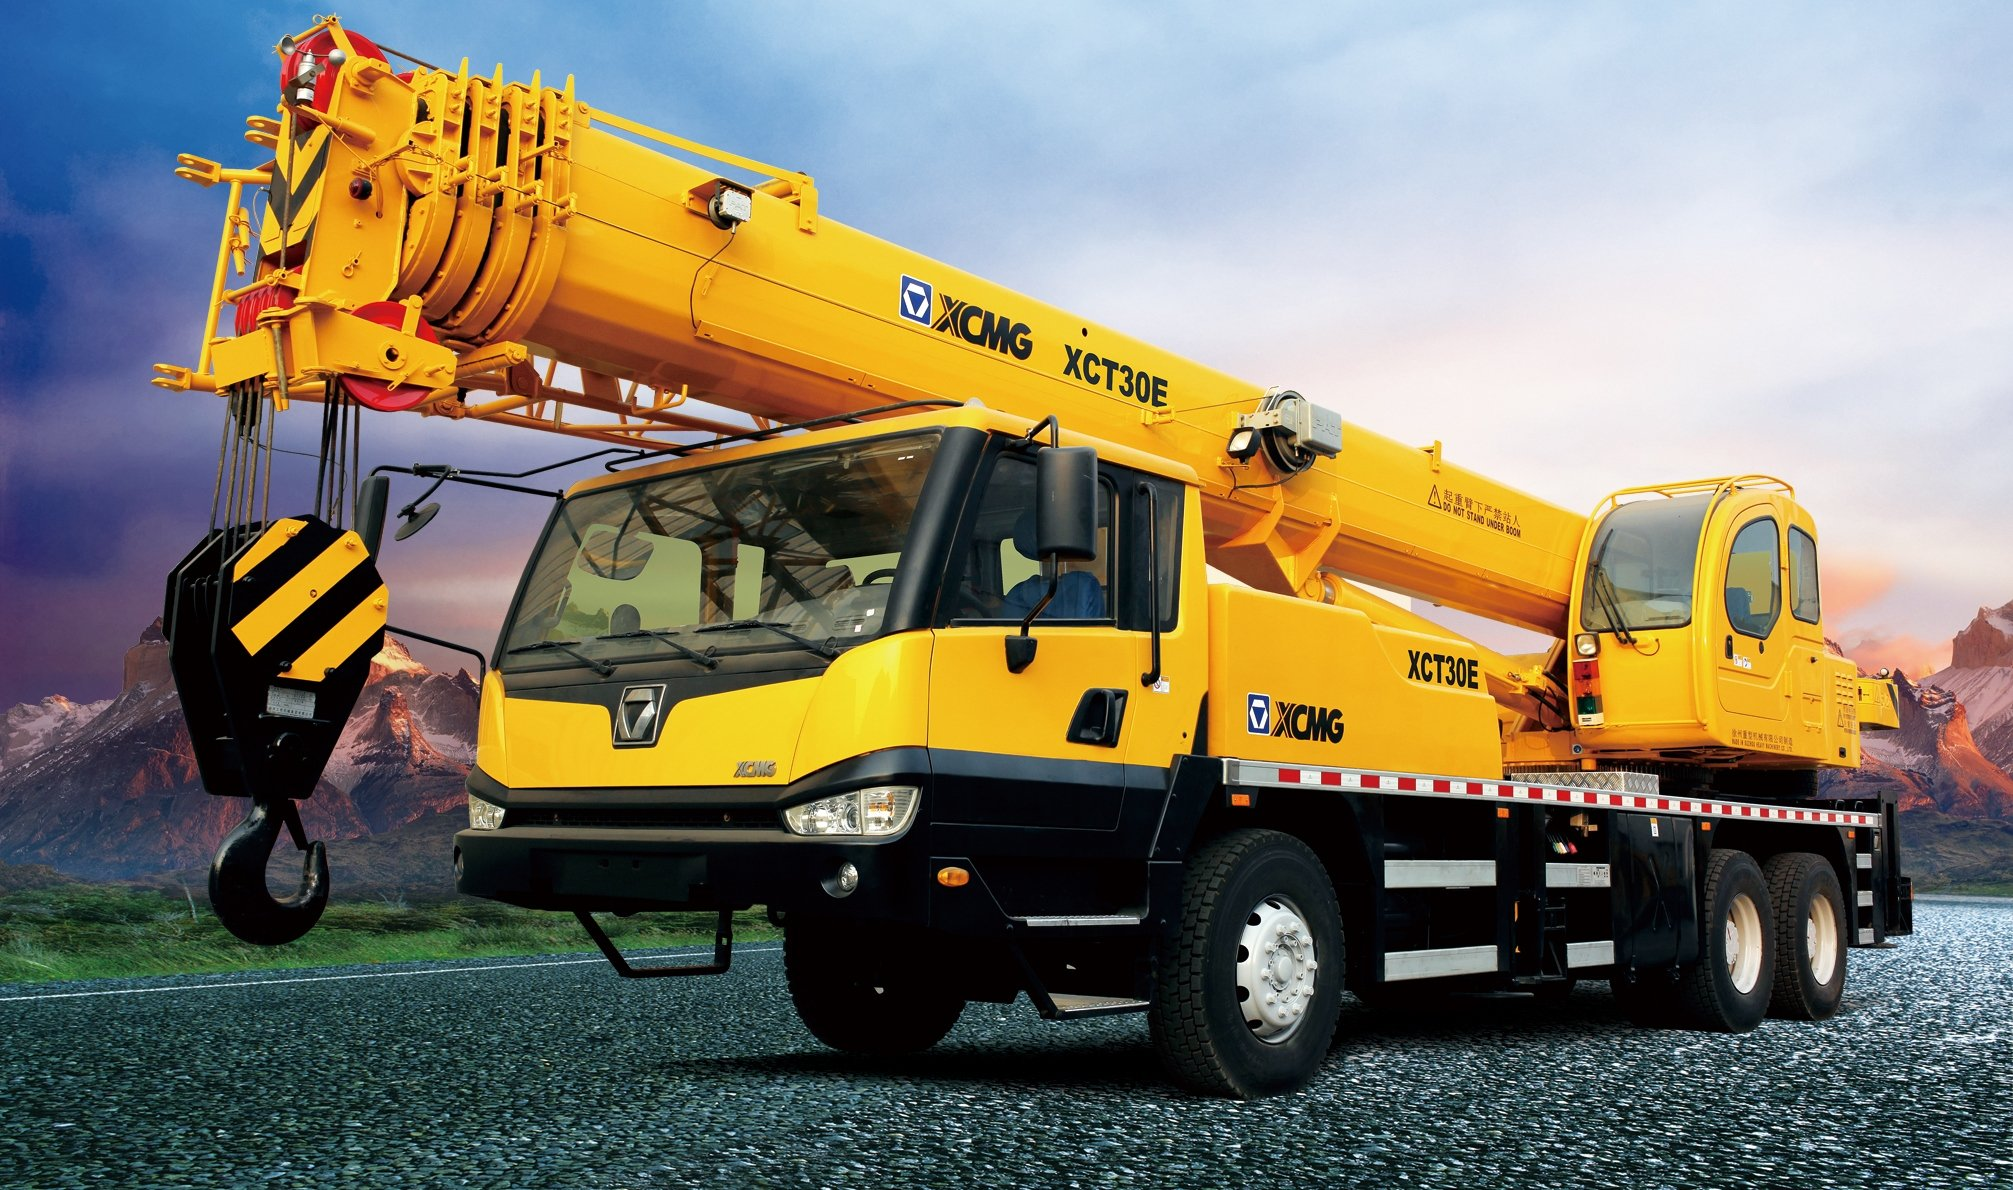 Mobile Crane Hoist : Mobile crane construction truck semi tractor ariel cranes